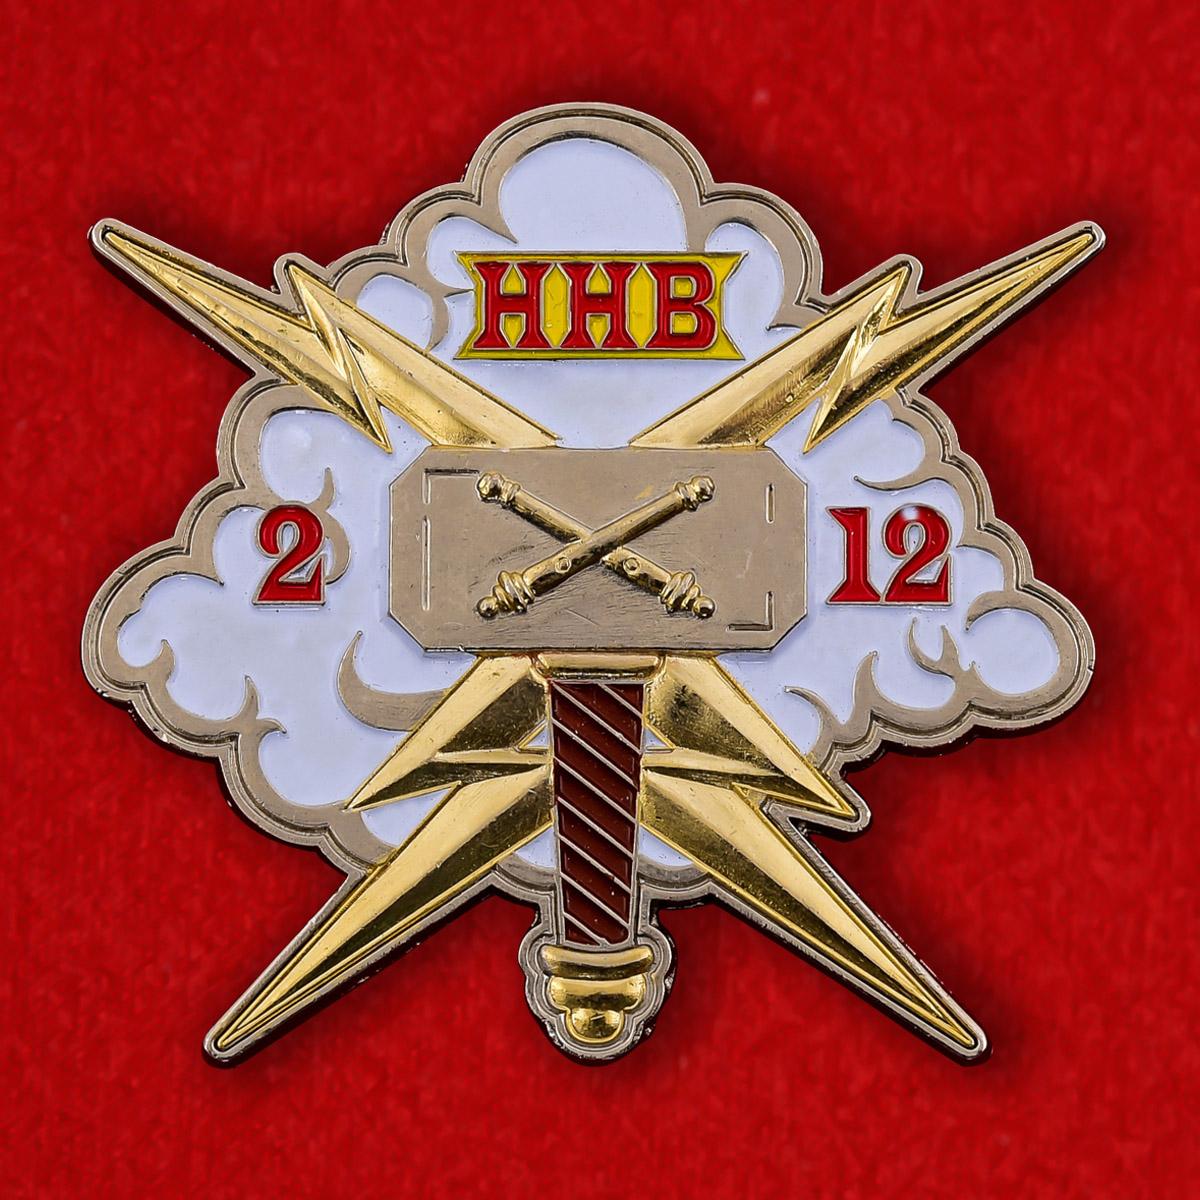 Челлендж коин 2-го батальона 12-го полка Полевой артиллерии армии США